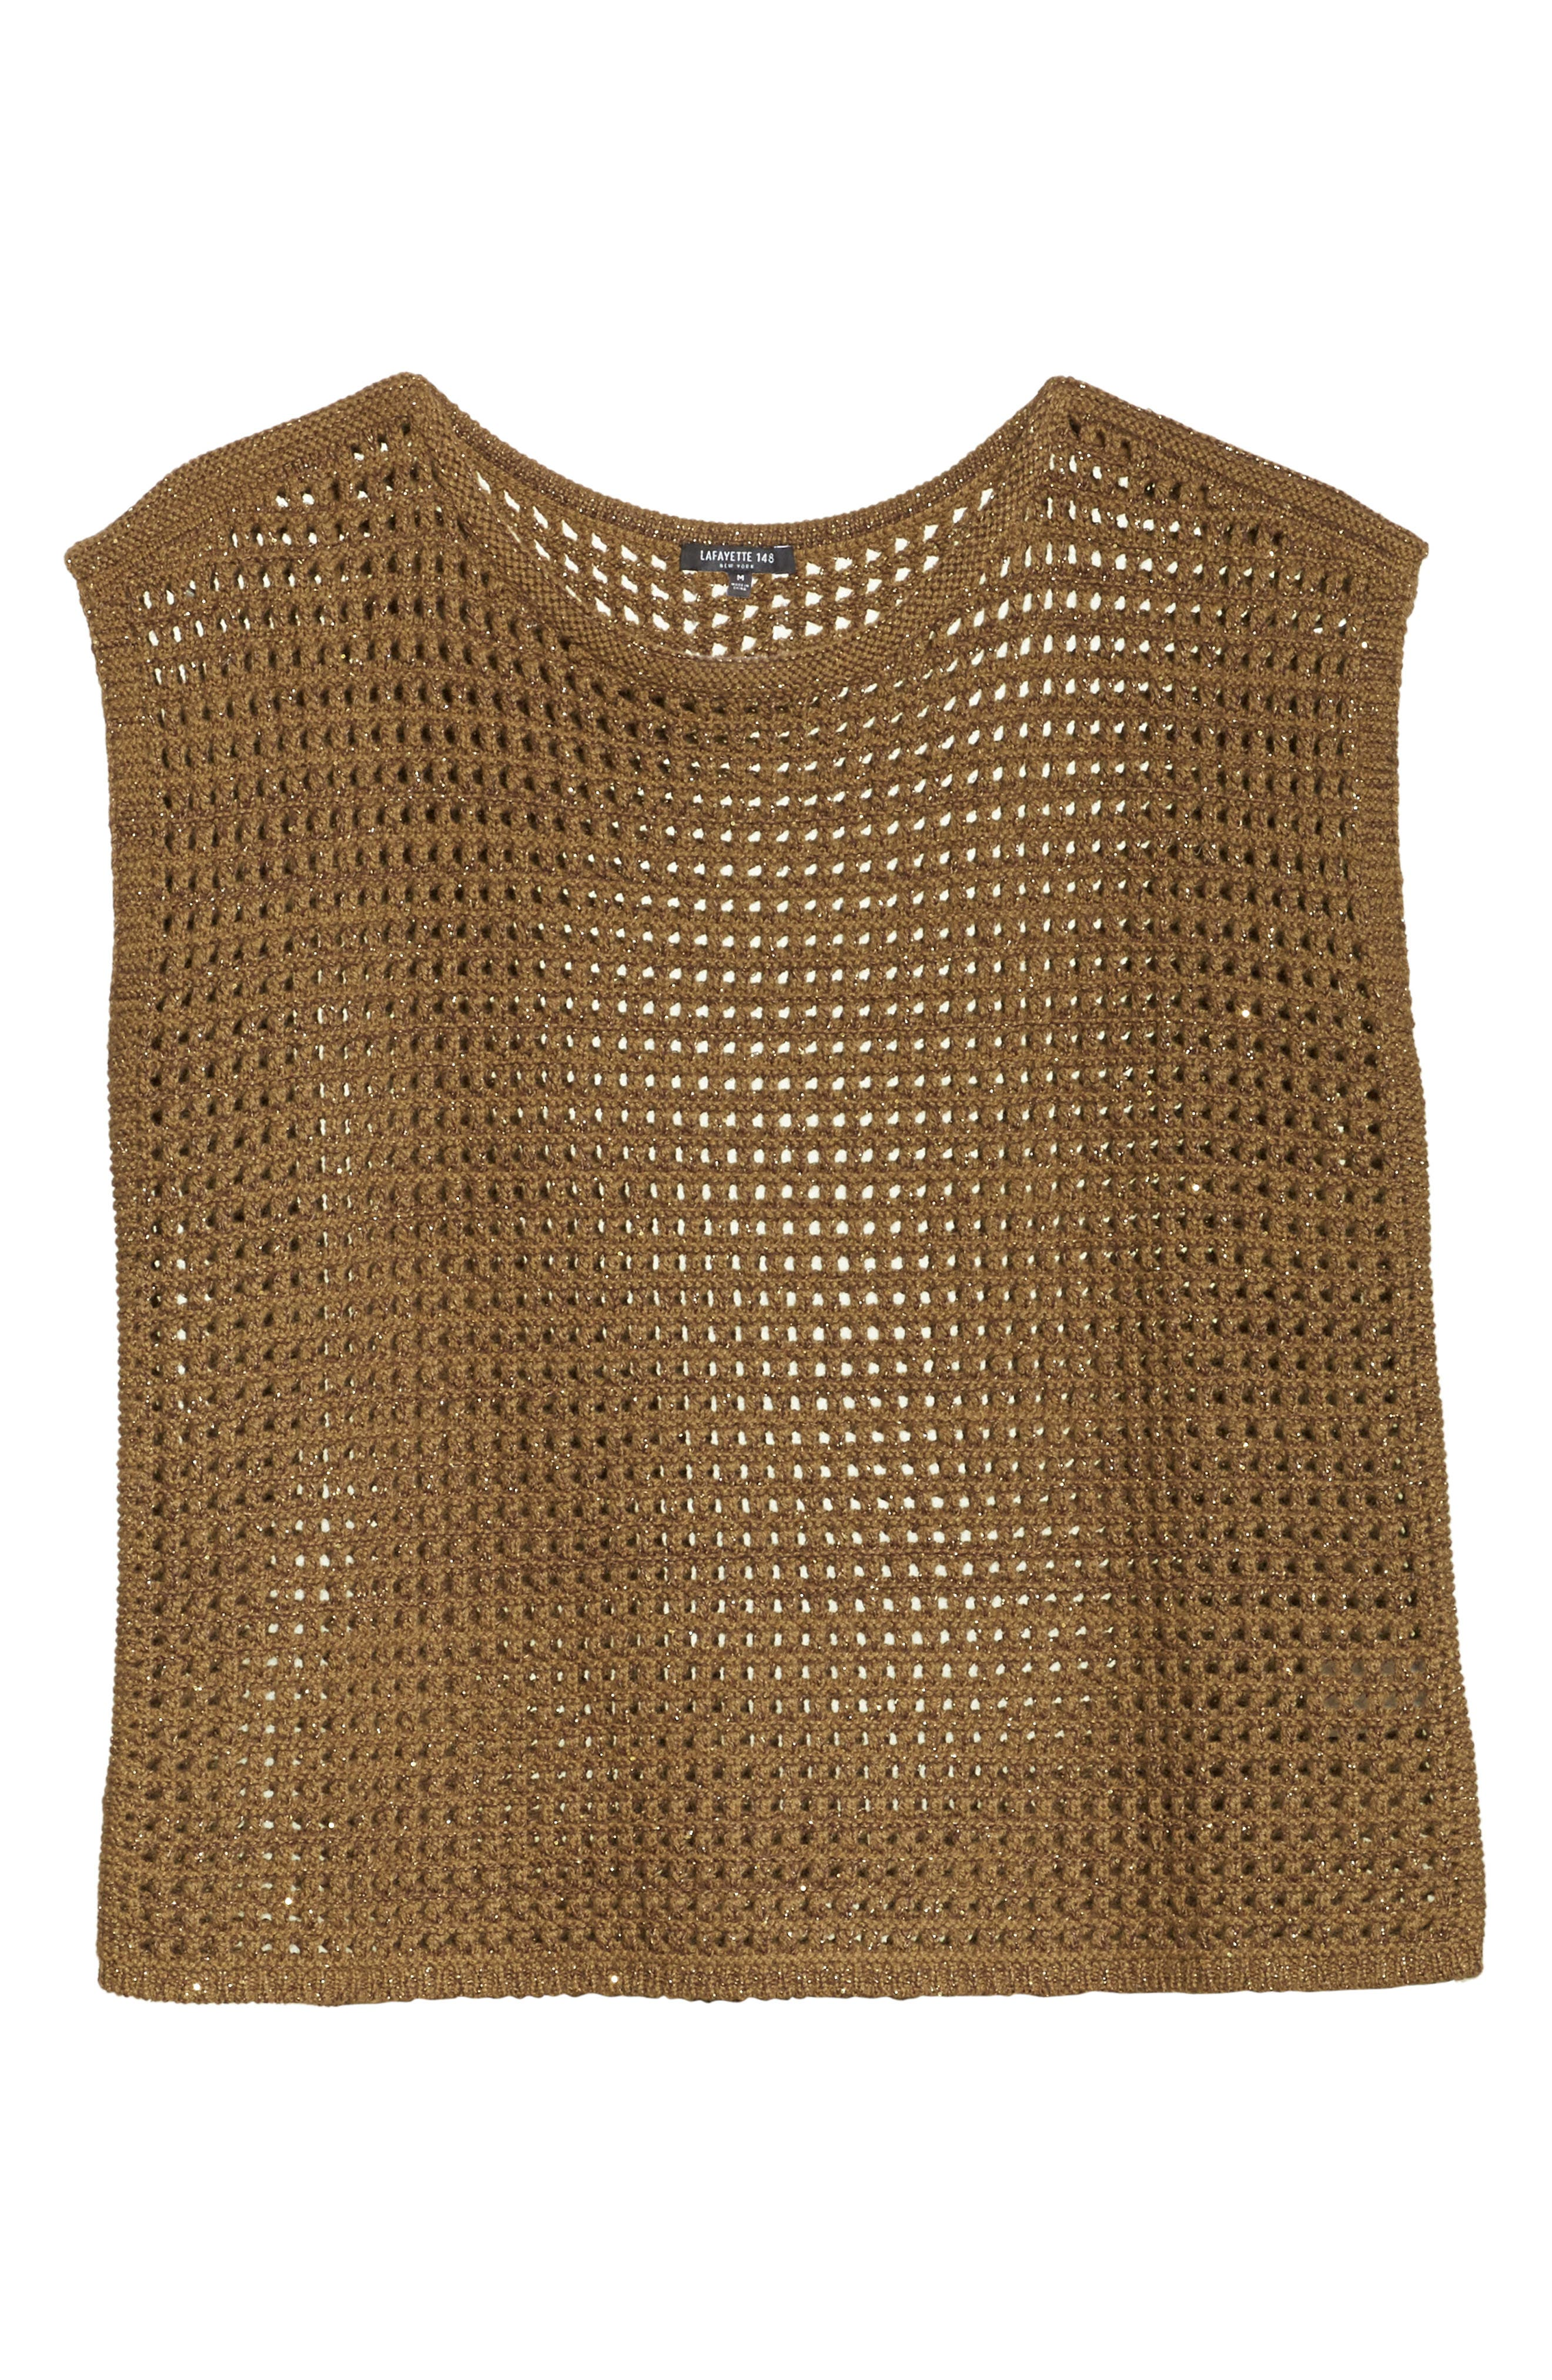 Cashmere Open Stitch Sequin Sweater,                             Alternate thumbnail 6, color,                             242